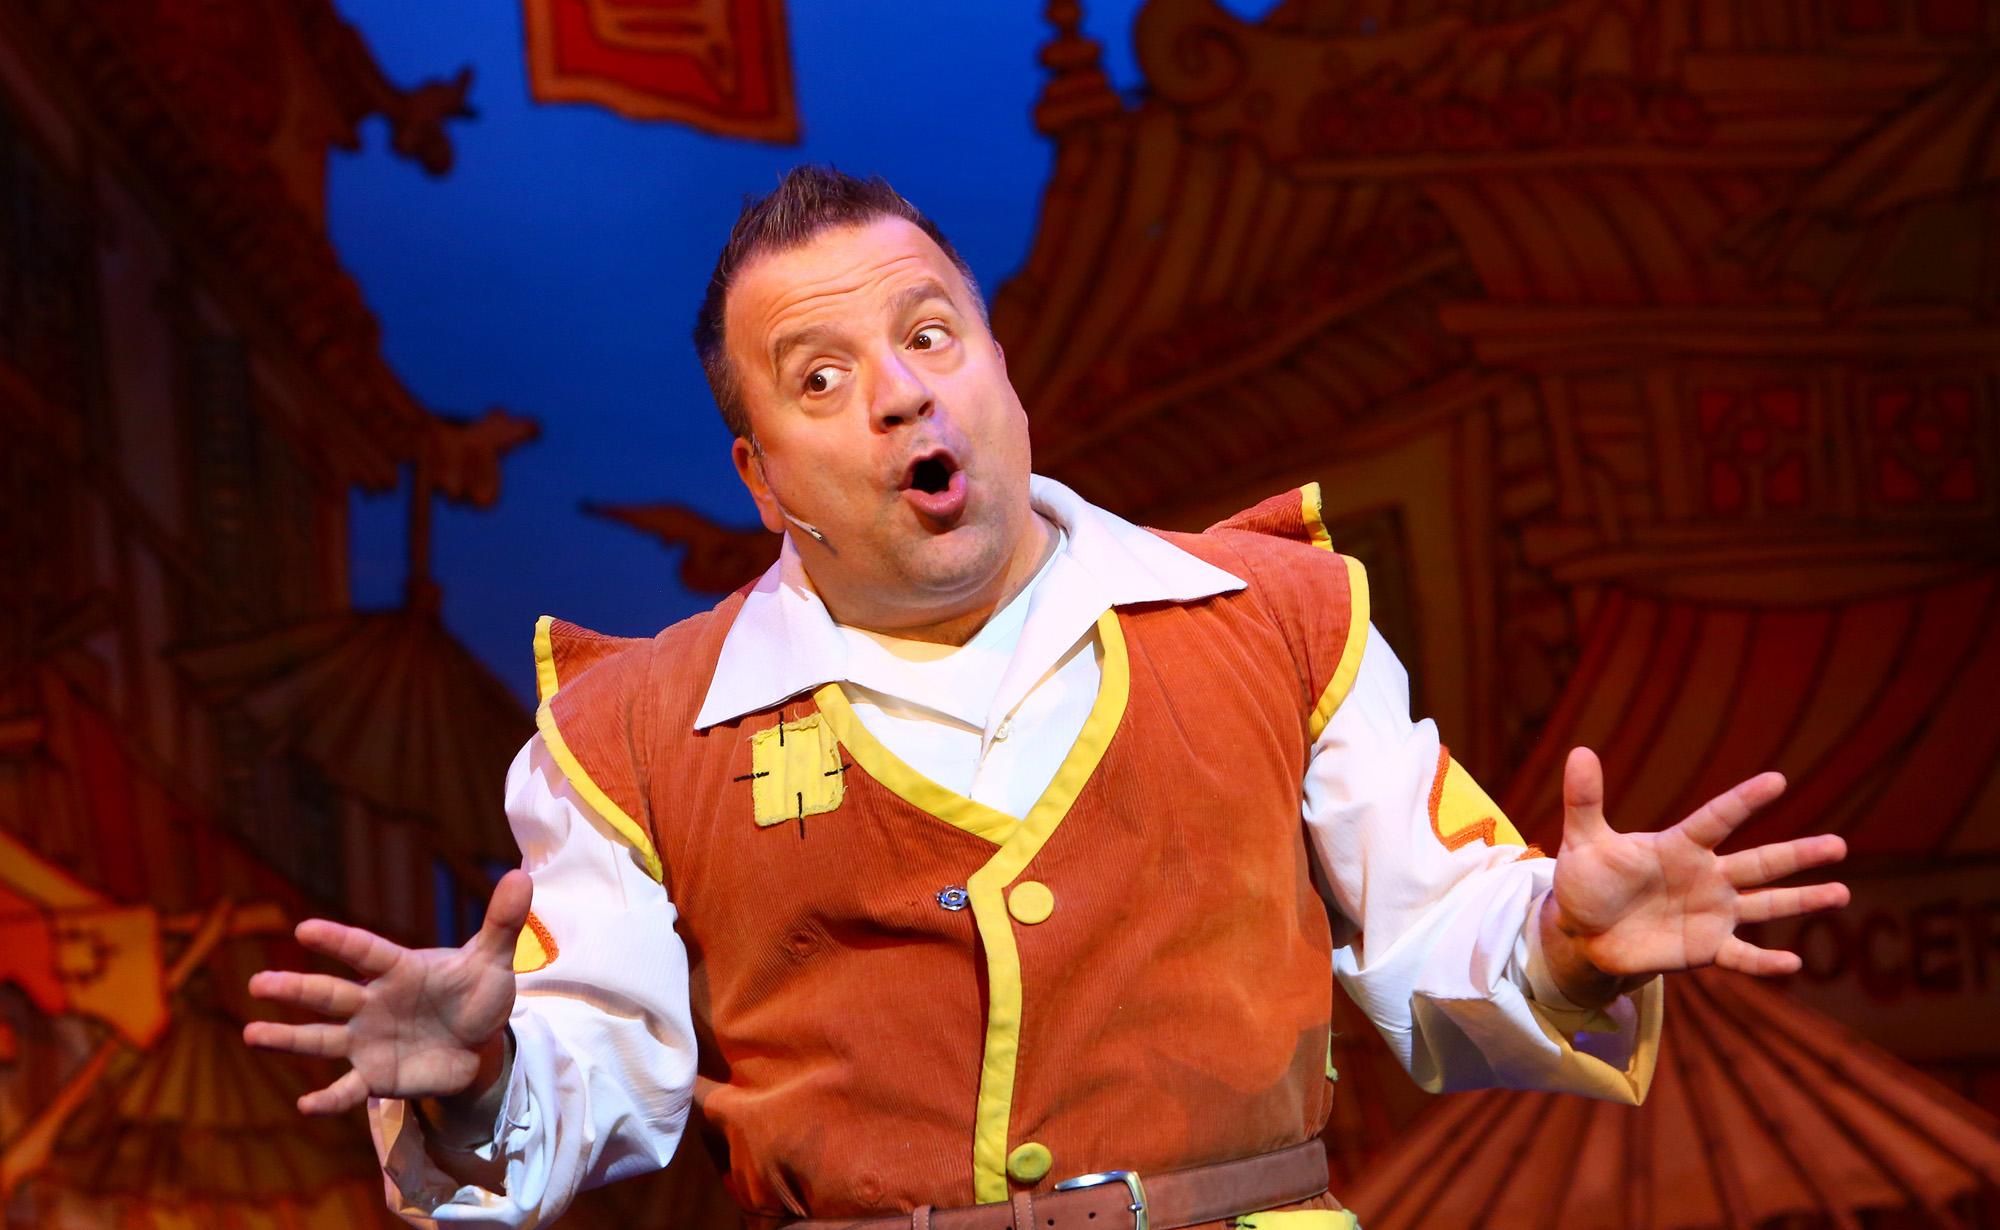 Aladdin. Kev Orkian. Milton Keynes Theatre pantomime, Christmas 2015. Aladdin stars Priscilla Presley, Gary Wilmot, Ben Adams, Wayne Sleep, Kev Orkian, Mark Pickering, Aimie Atkinson and Phil Holden.